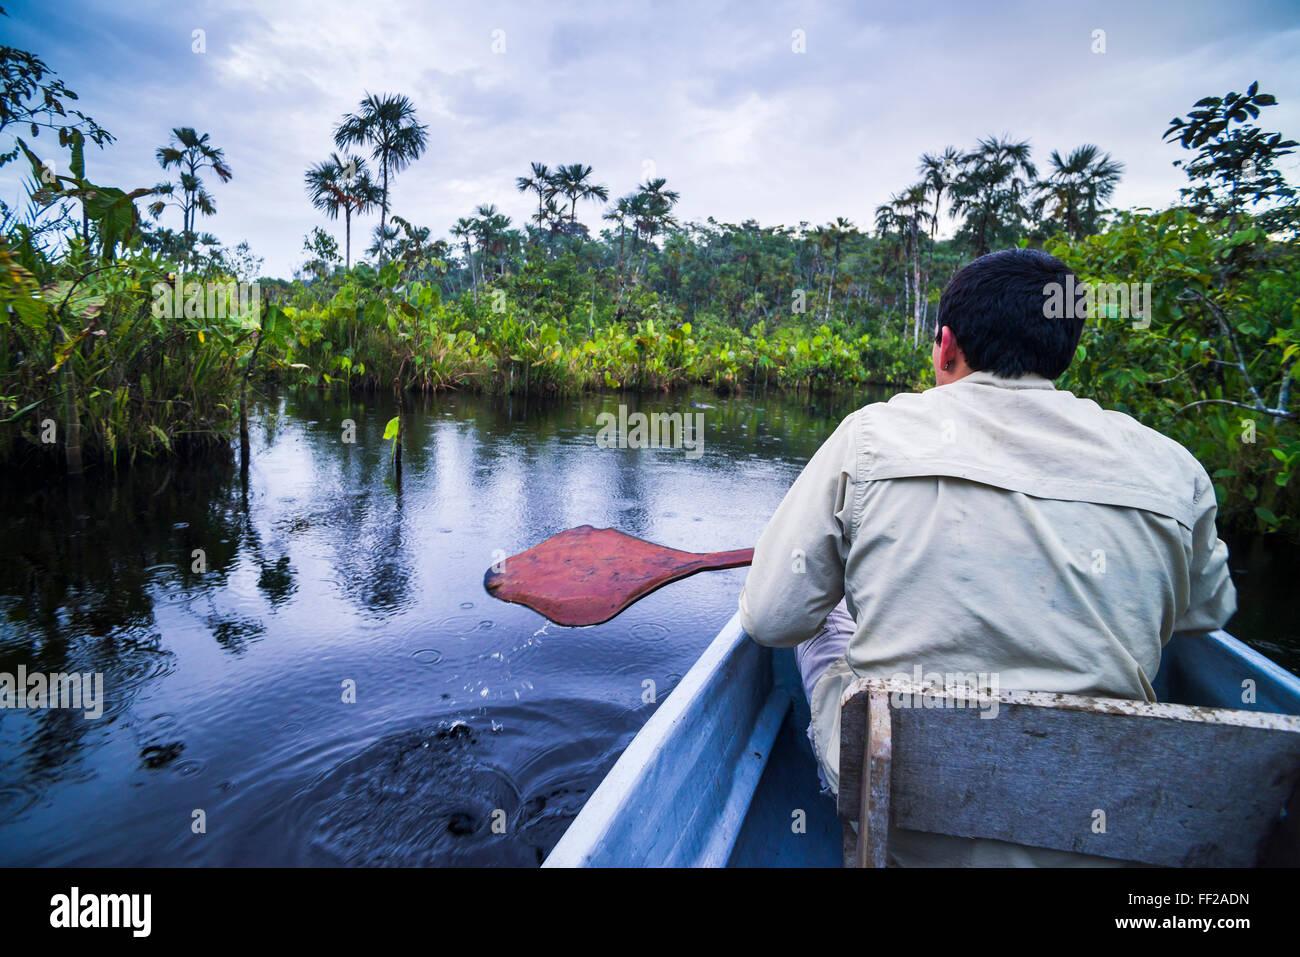 Piragua paseo en barco en el estrecho canal, Selva Amazónica, Coca, Ecuador, Sudamérica Imagen De Stock